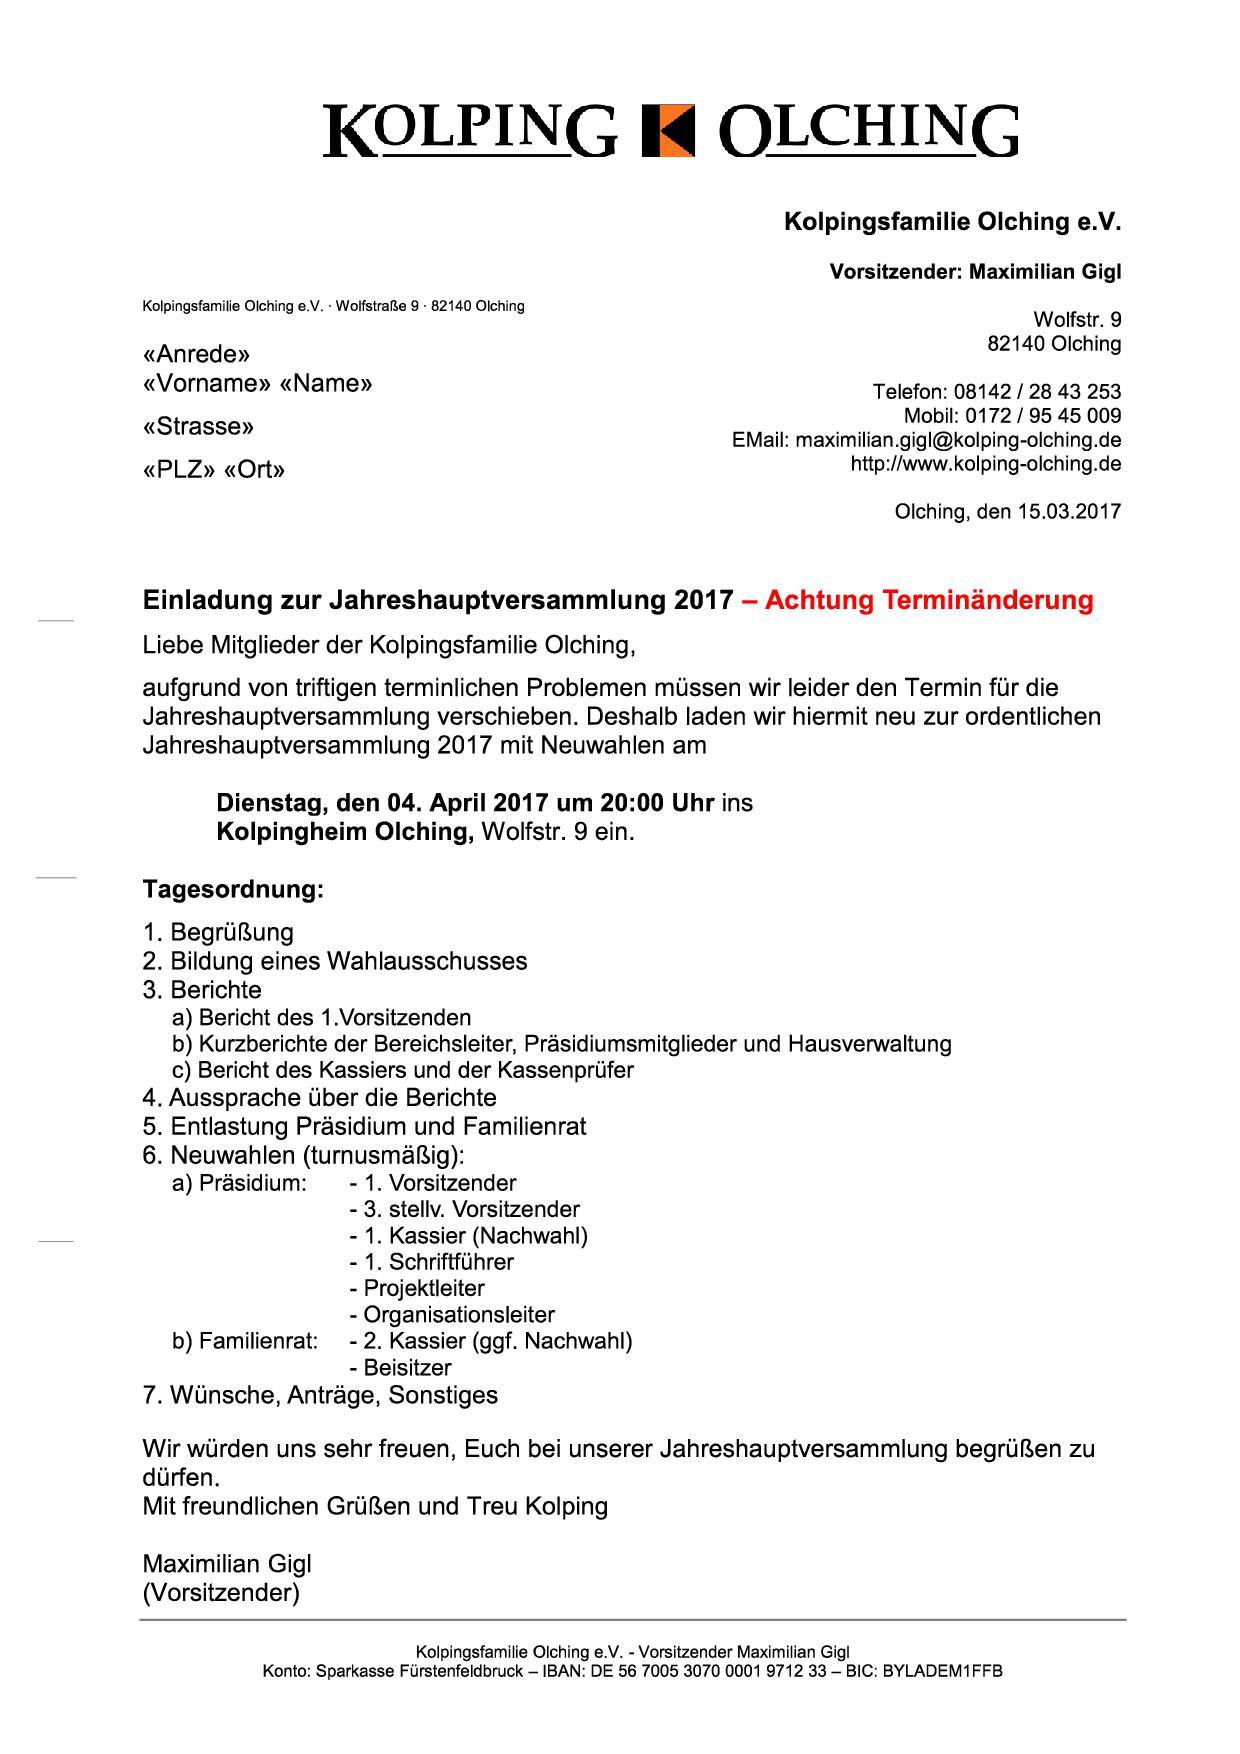 Colorful Bericht Dokumentvorlage Gallery - FORTSETZUNG ARBEITSBLATT ...